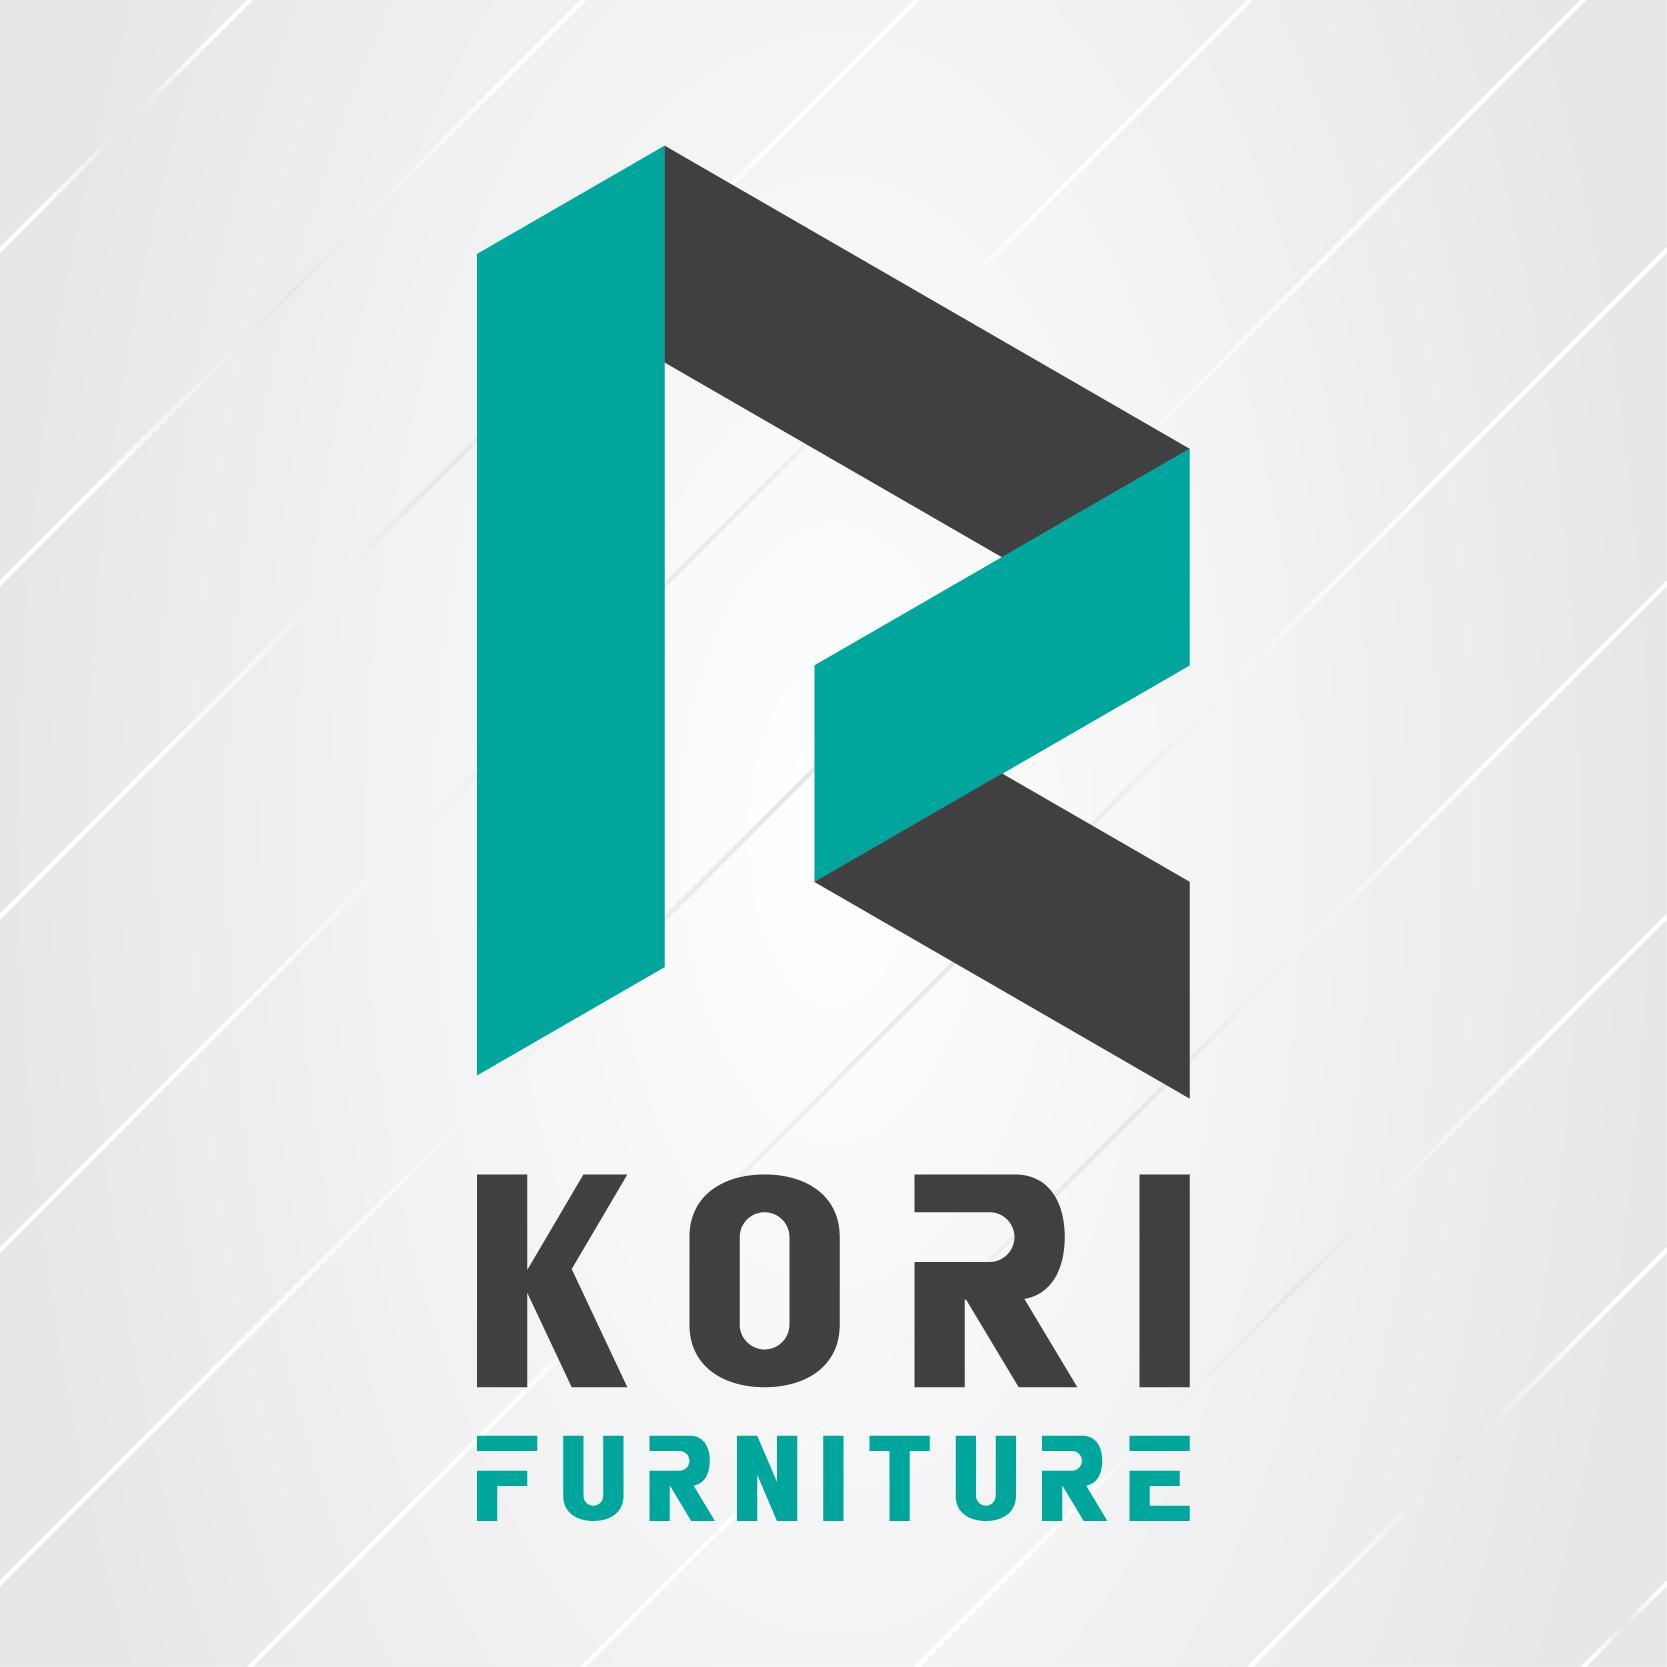 KORI.COM.VN